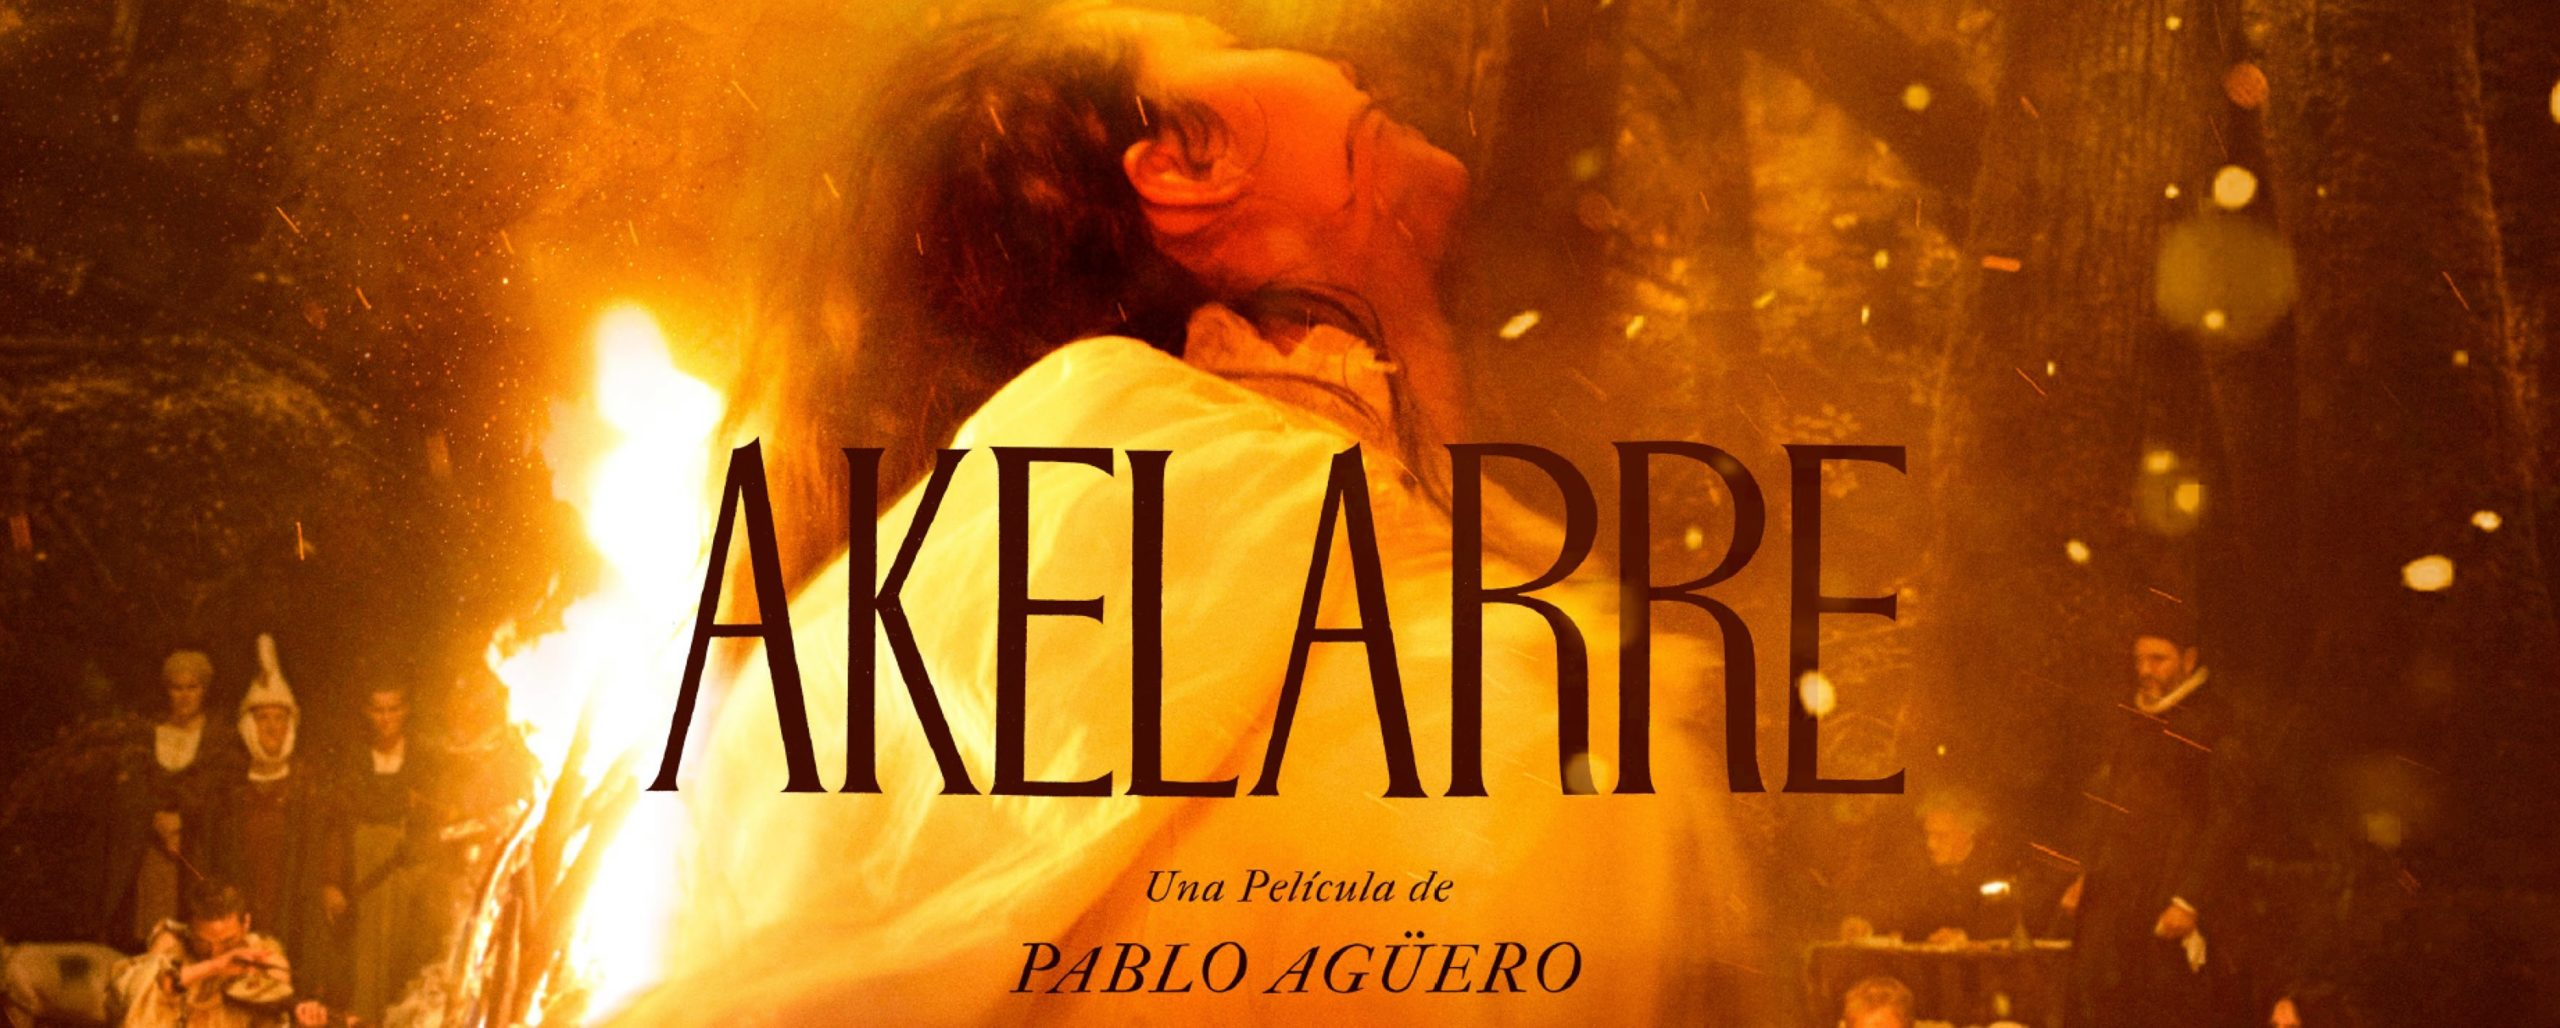 Akelarre (Tráiler Oficial)